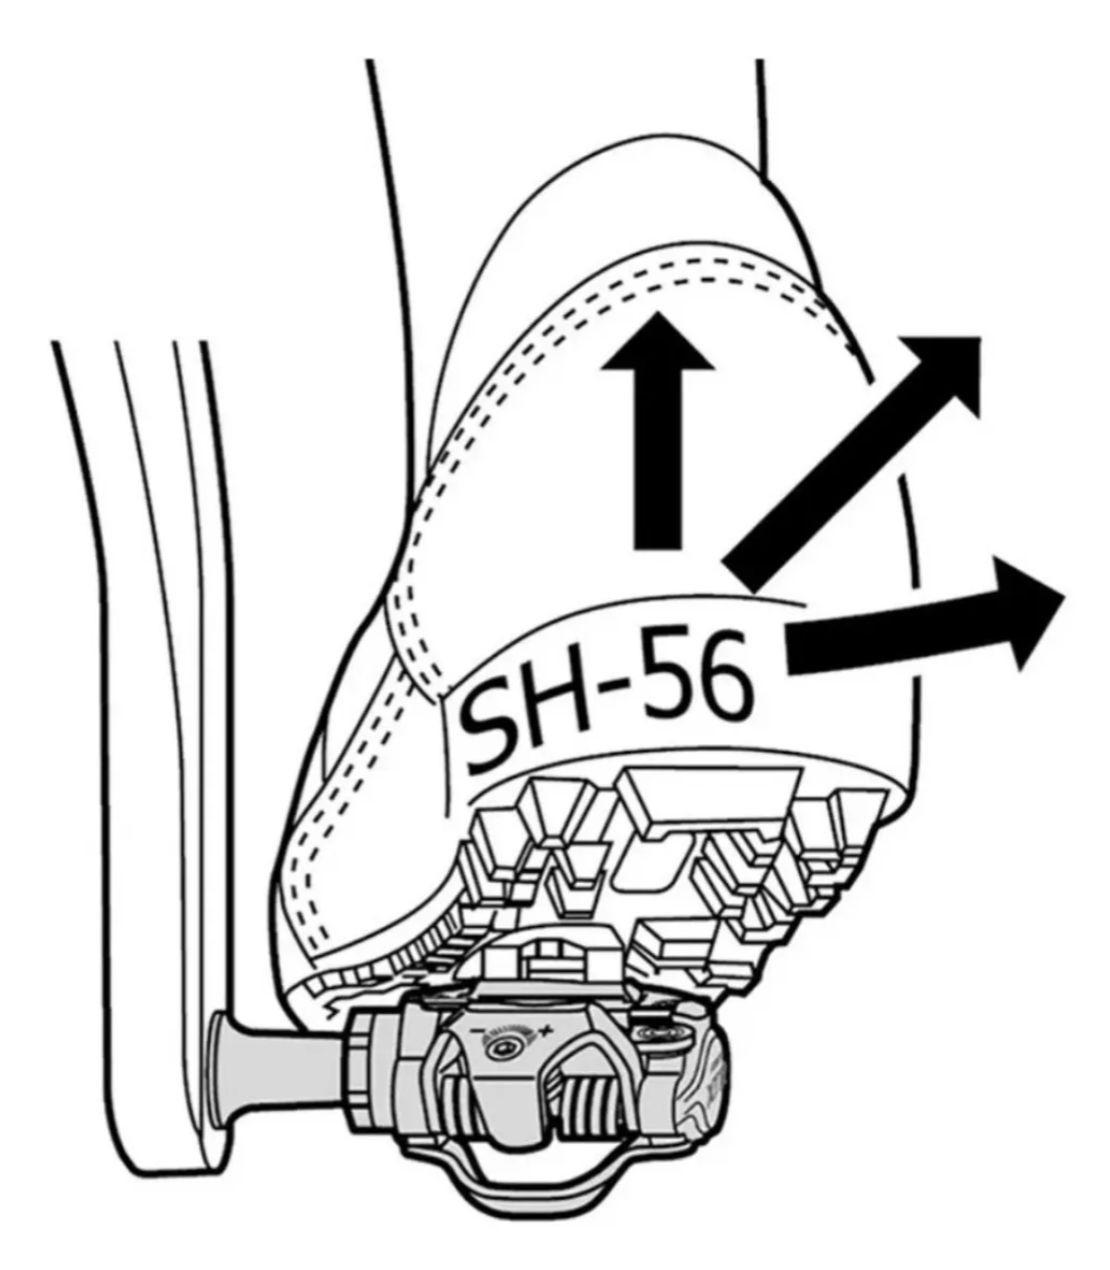 Tacos Pedal Shimano Sm-sh56 Multidirecional Clip Bicicleta